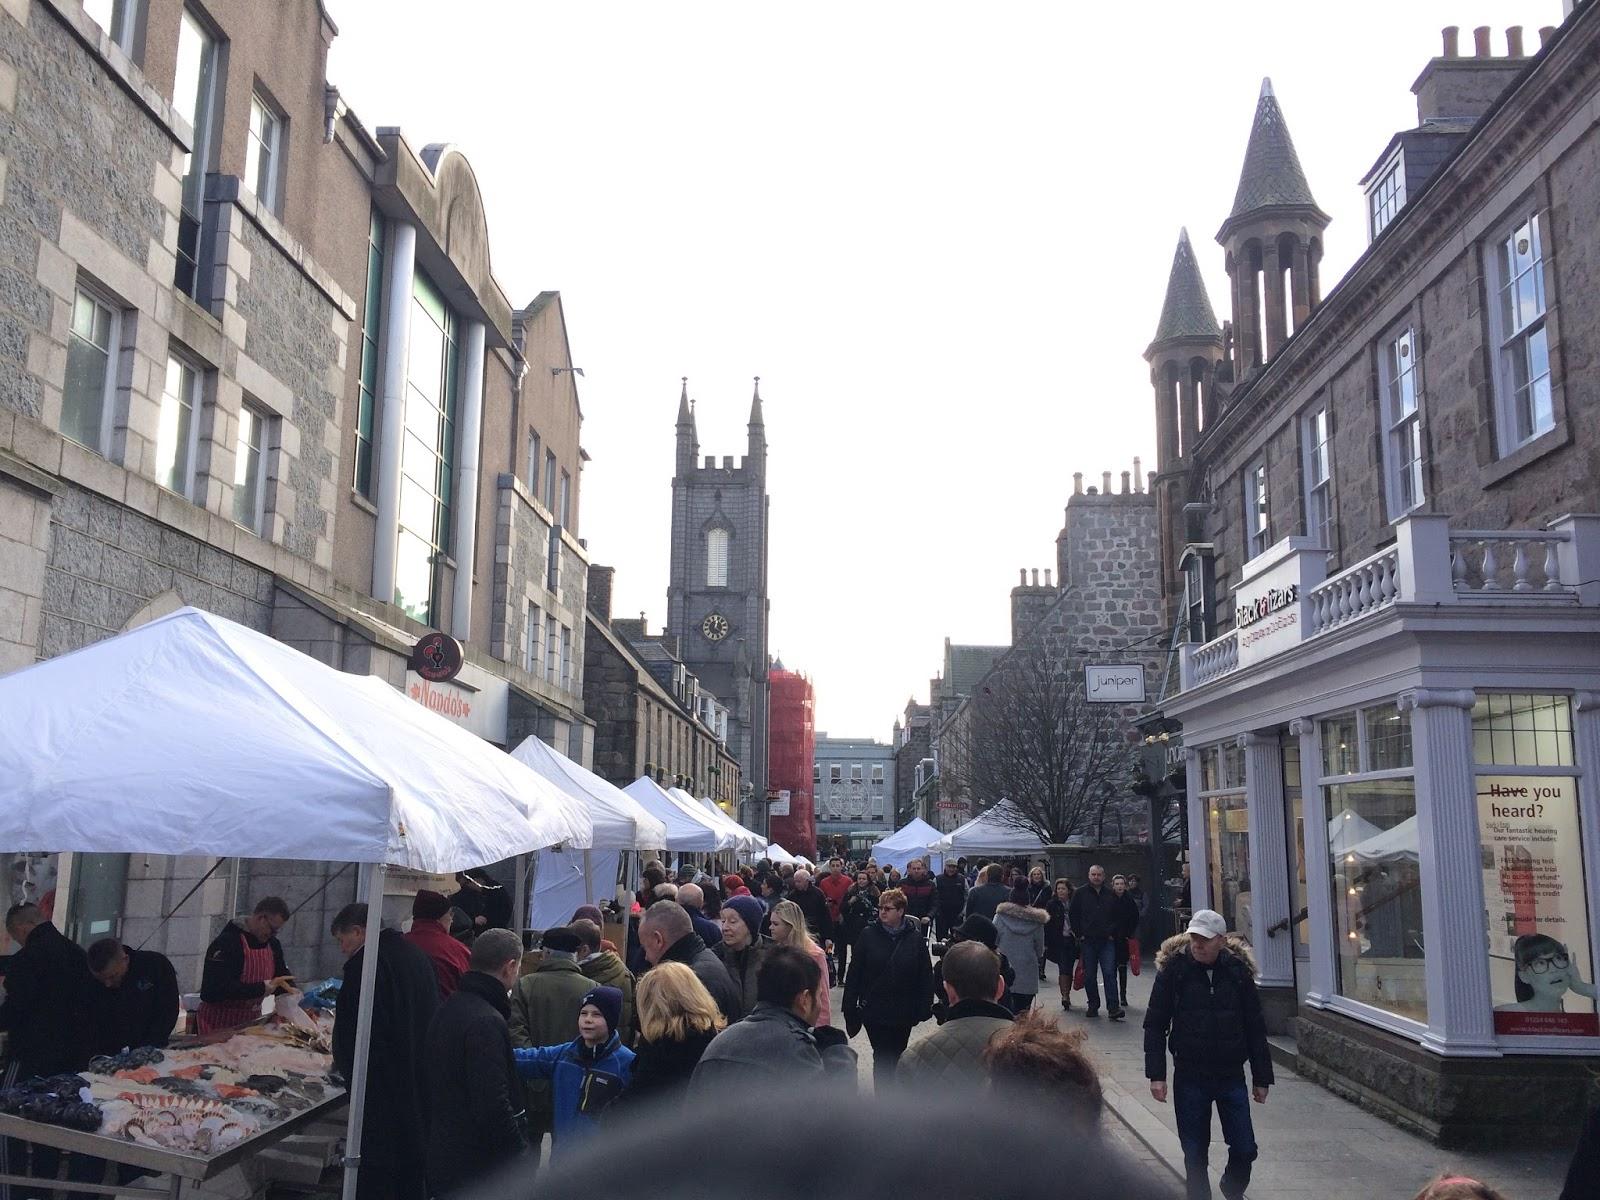 Ameri Ecosse Exploring Aberdeen A Pictorial